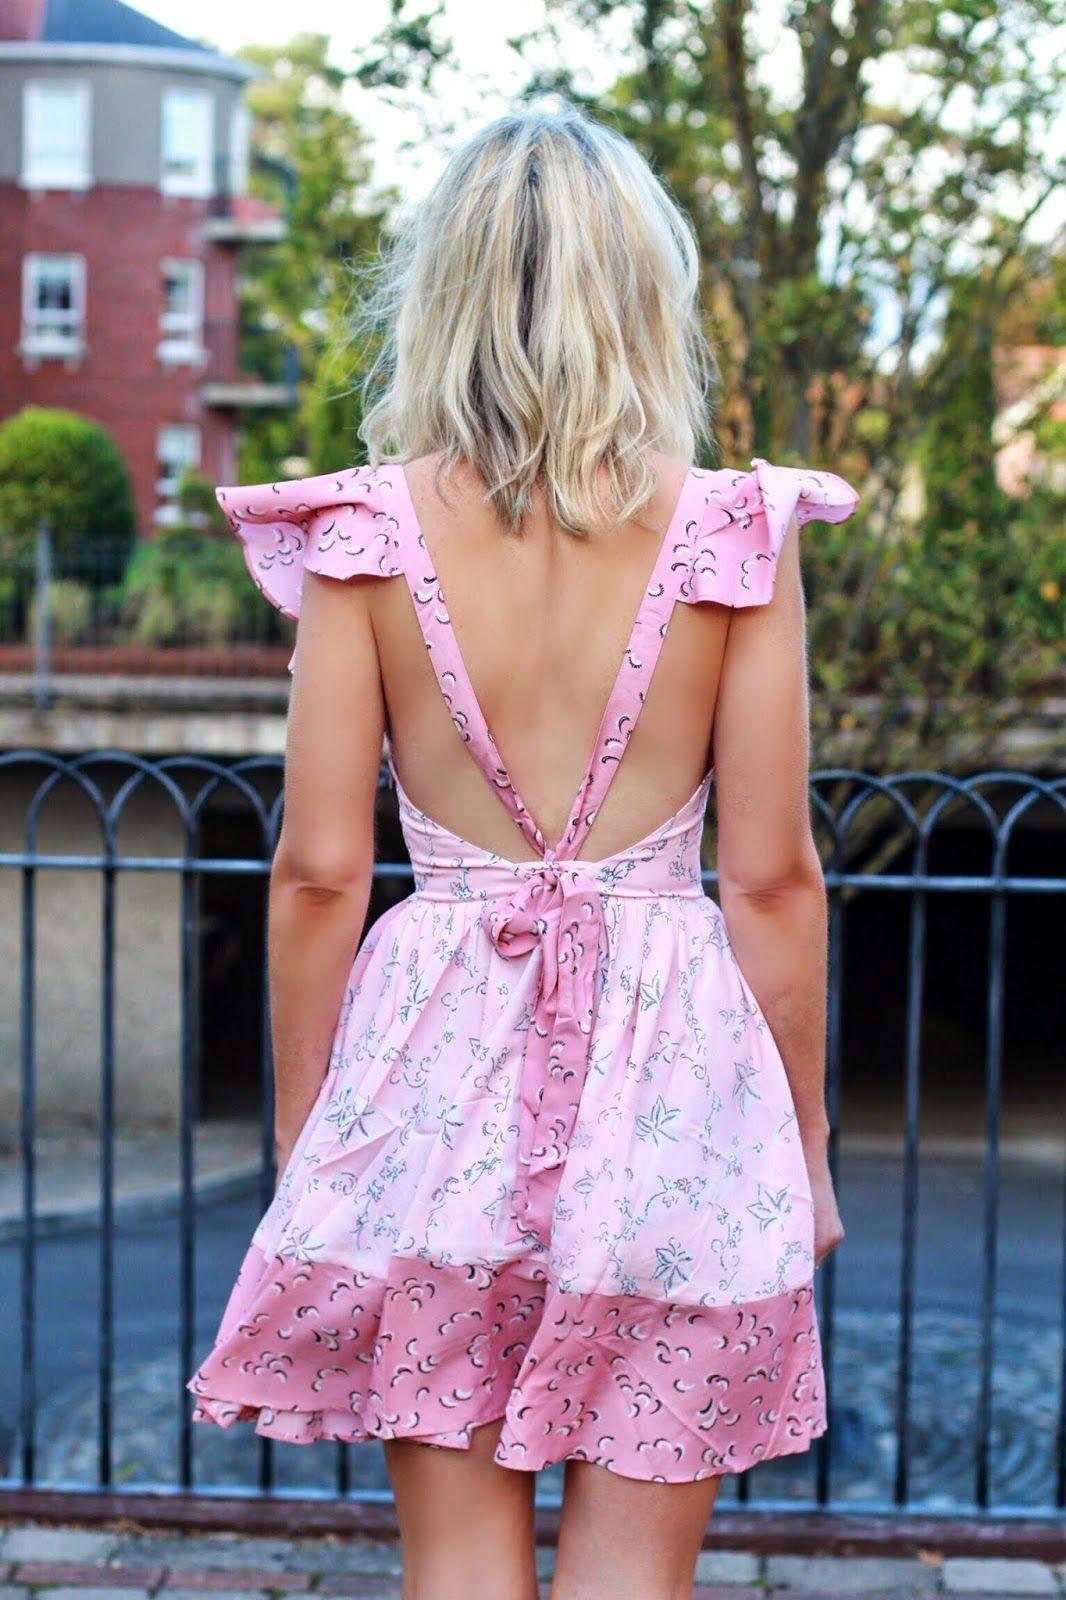 Asos pink backless dress | everything | Pinterest | Backless dresses ...